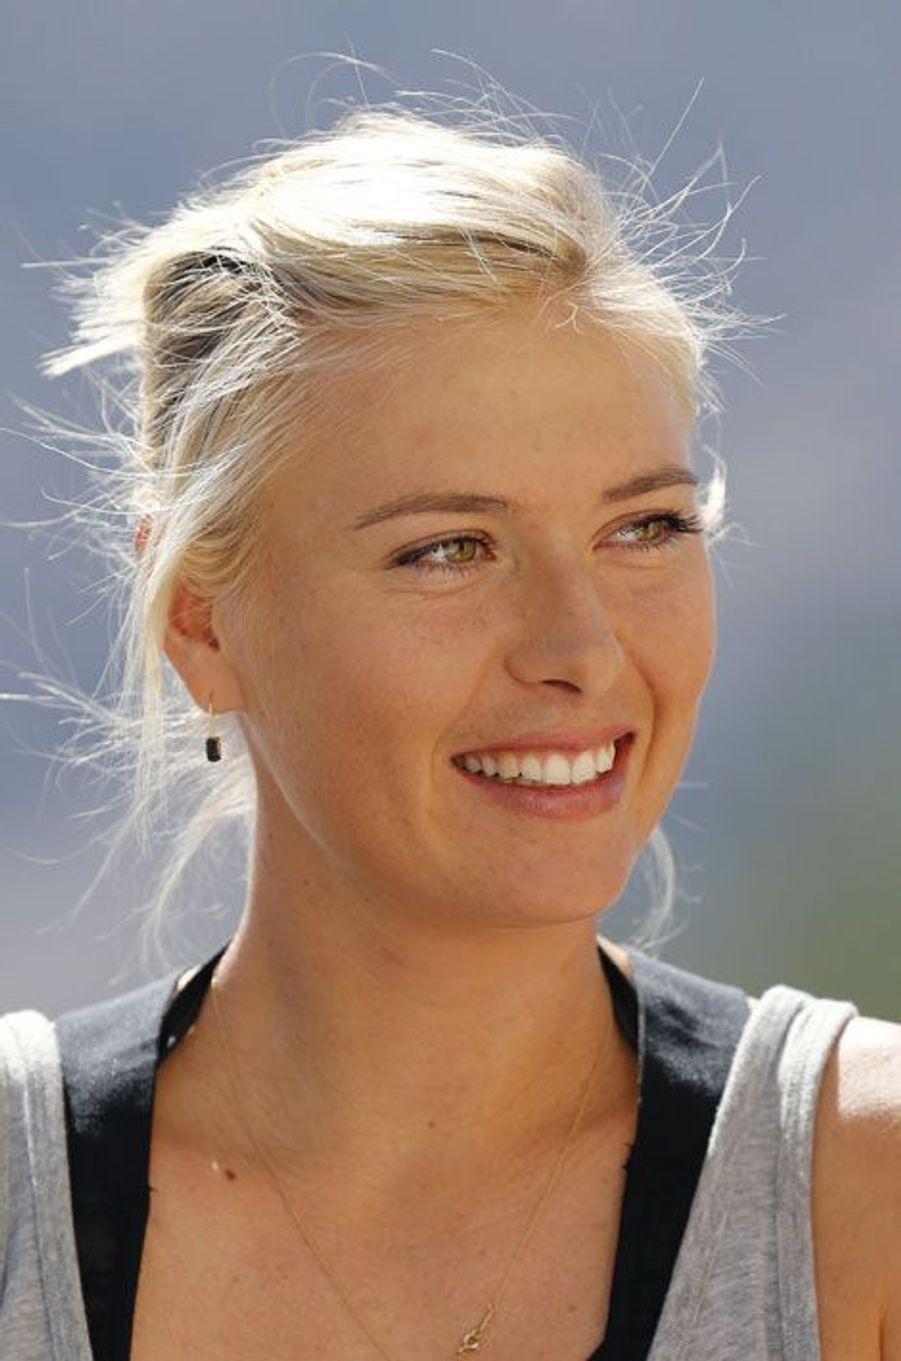 Maria Sharapova (Russie)